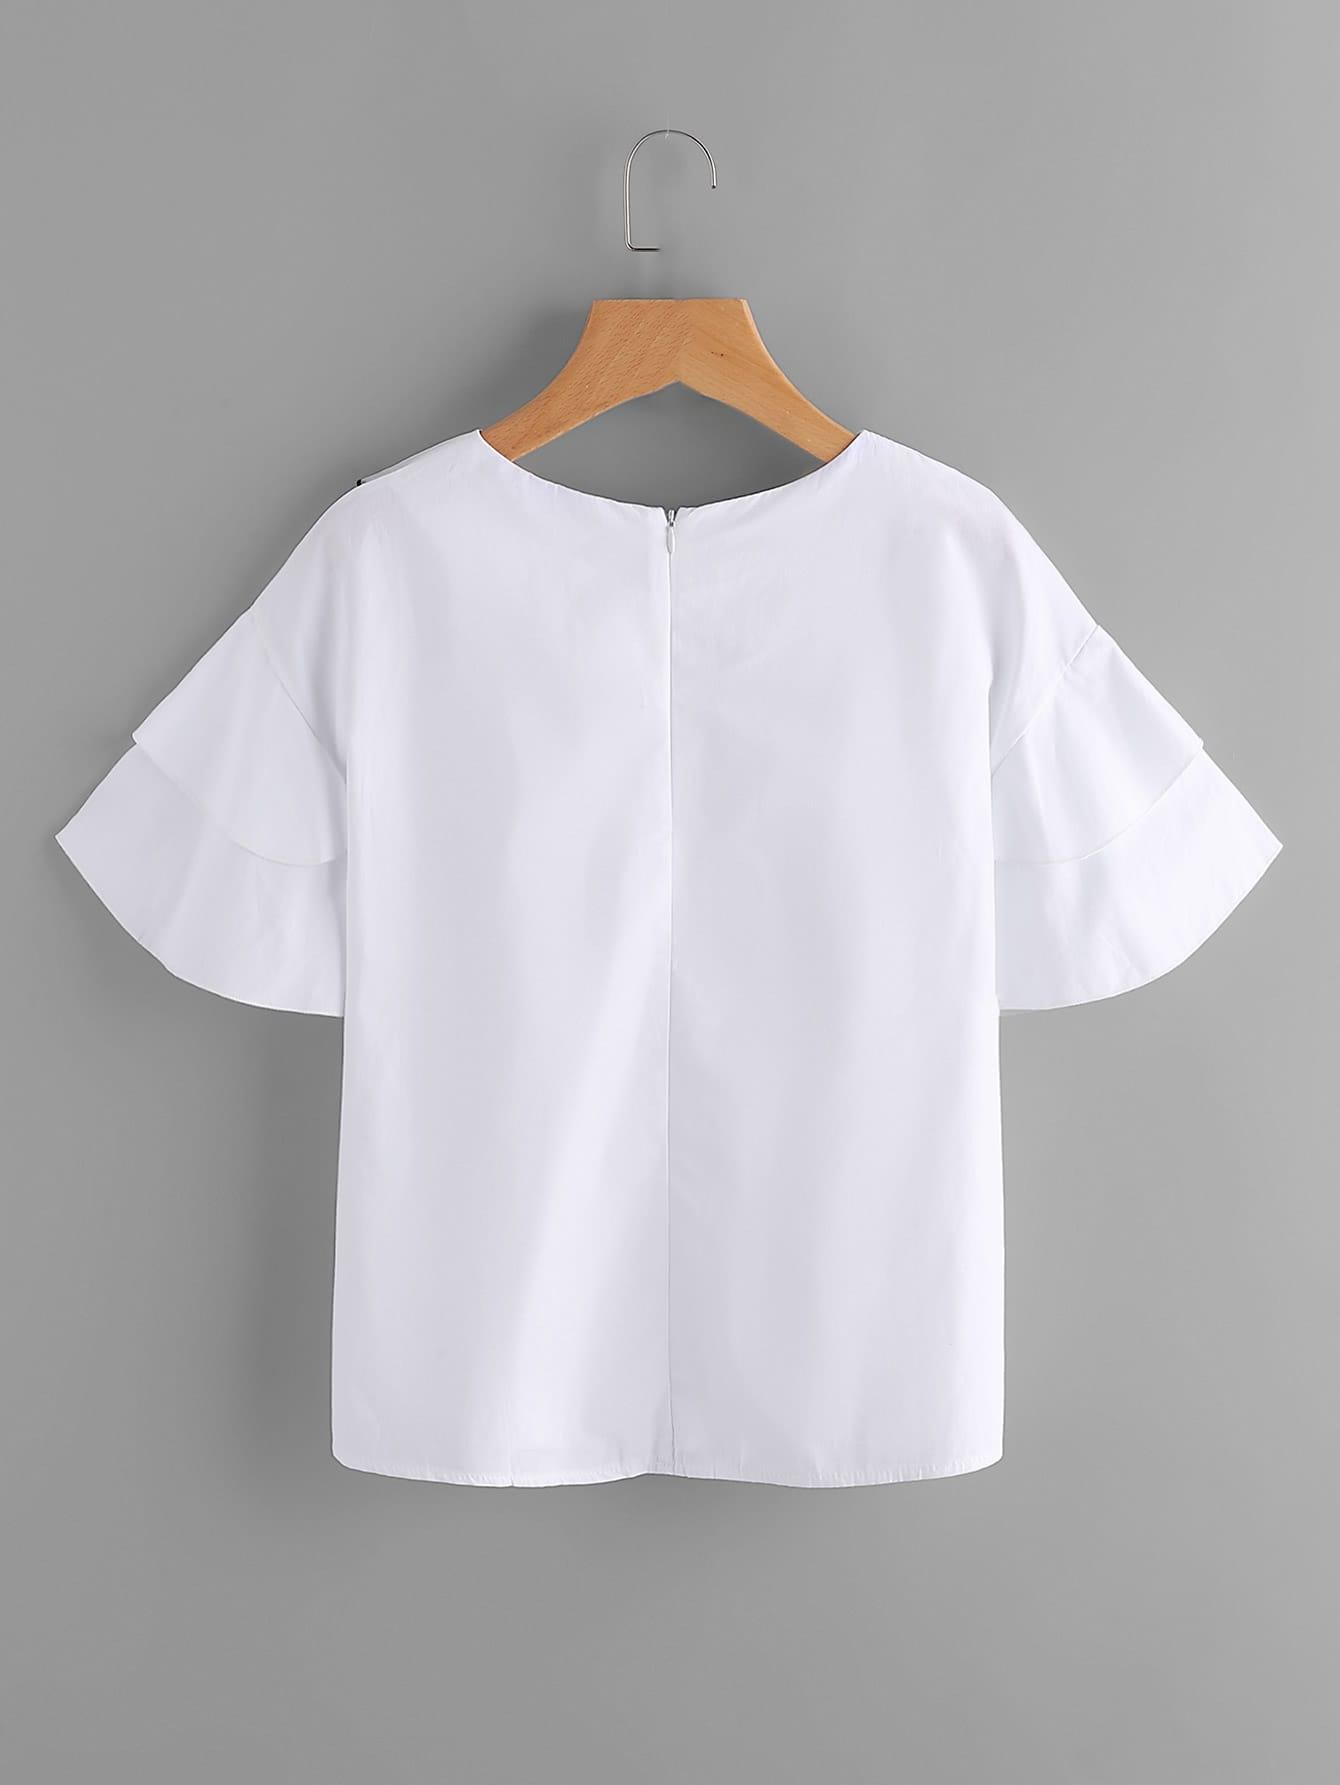 blouse170605107_2